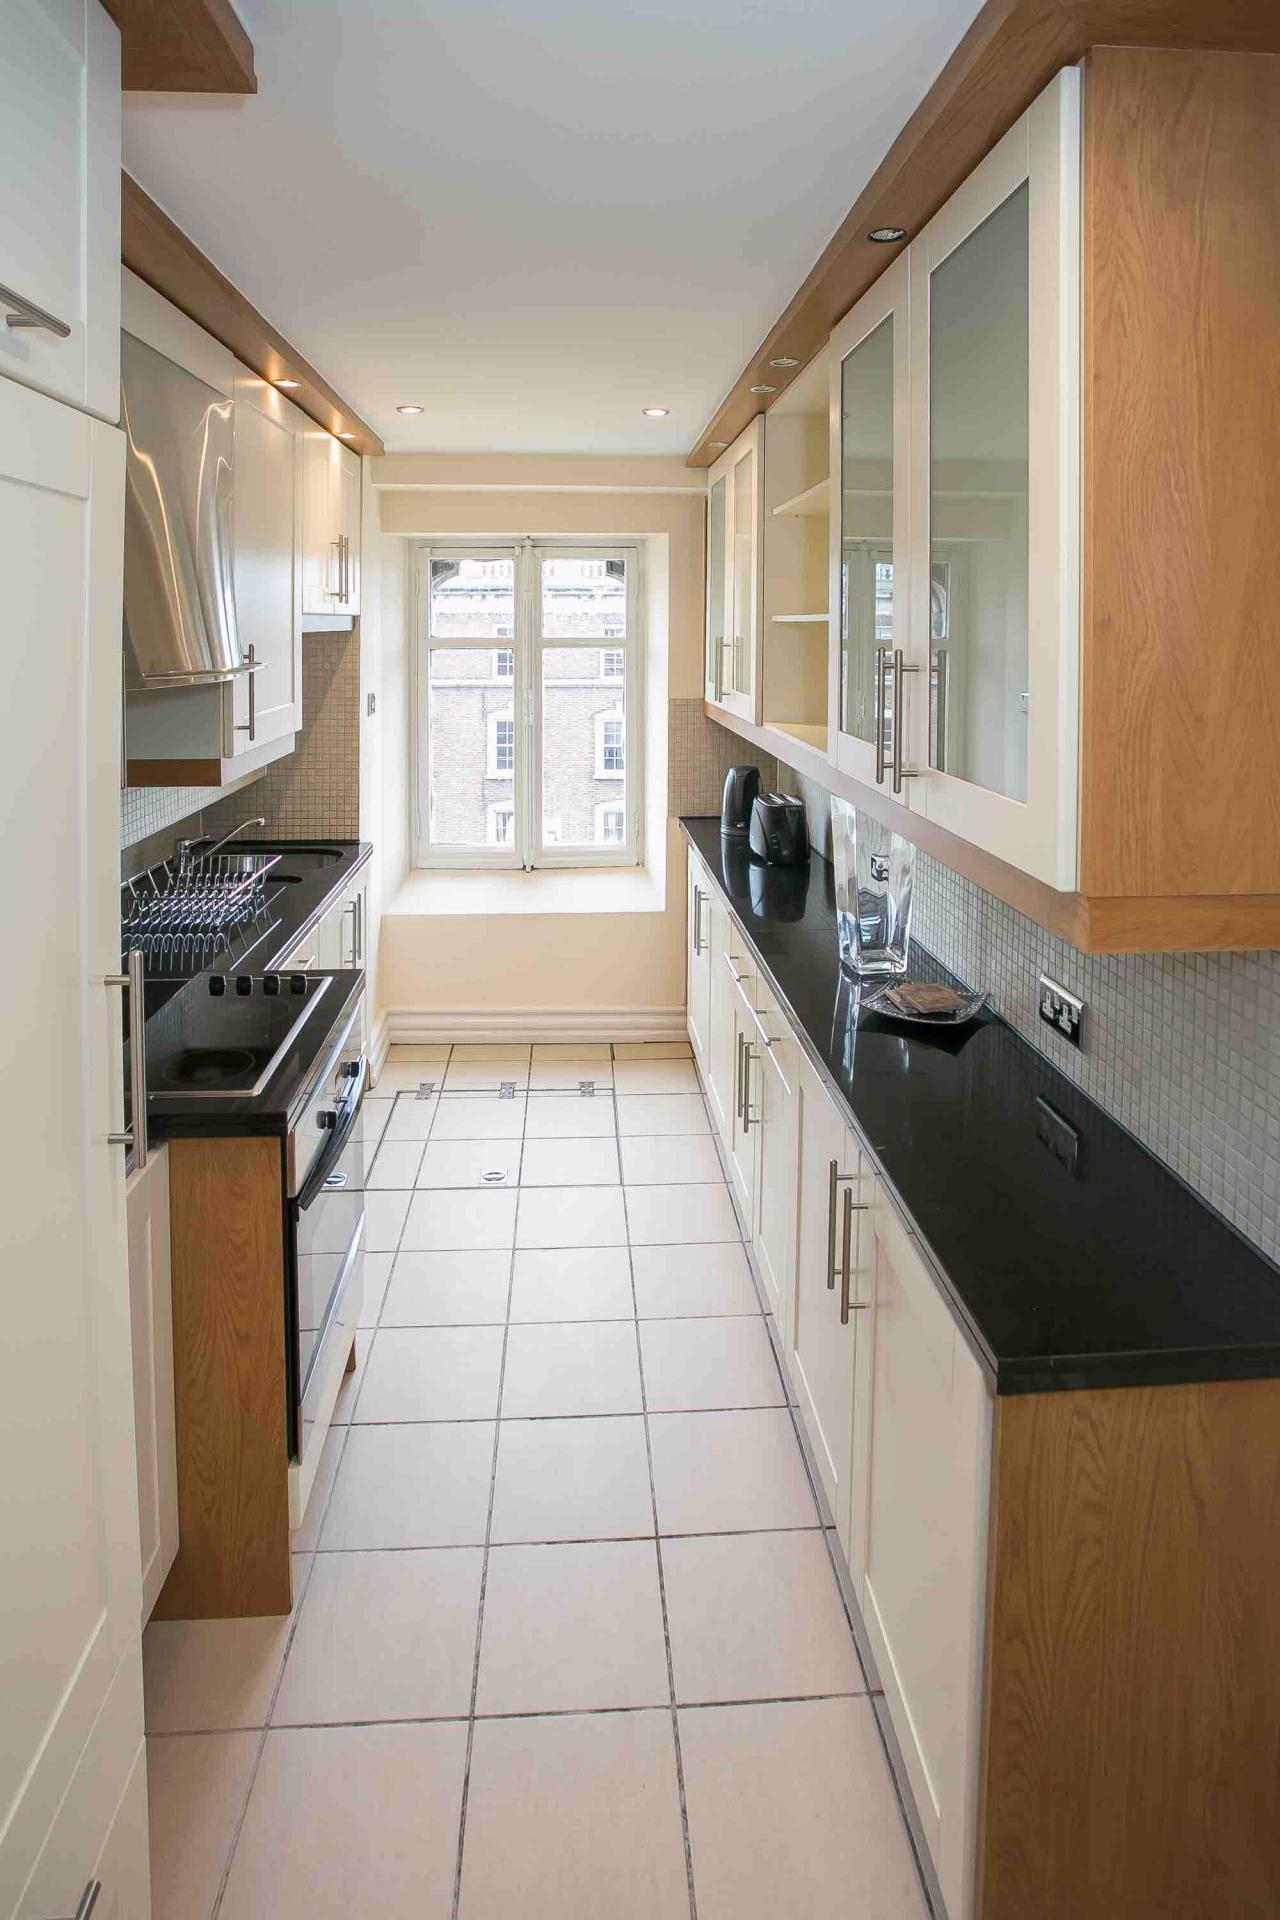 Kitchen at O'Connell Bridge Apartments, Centre, Dublin